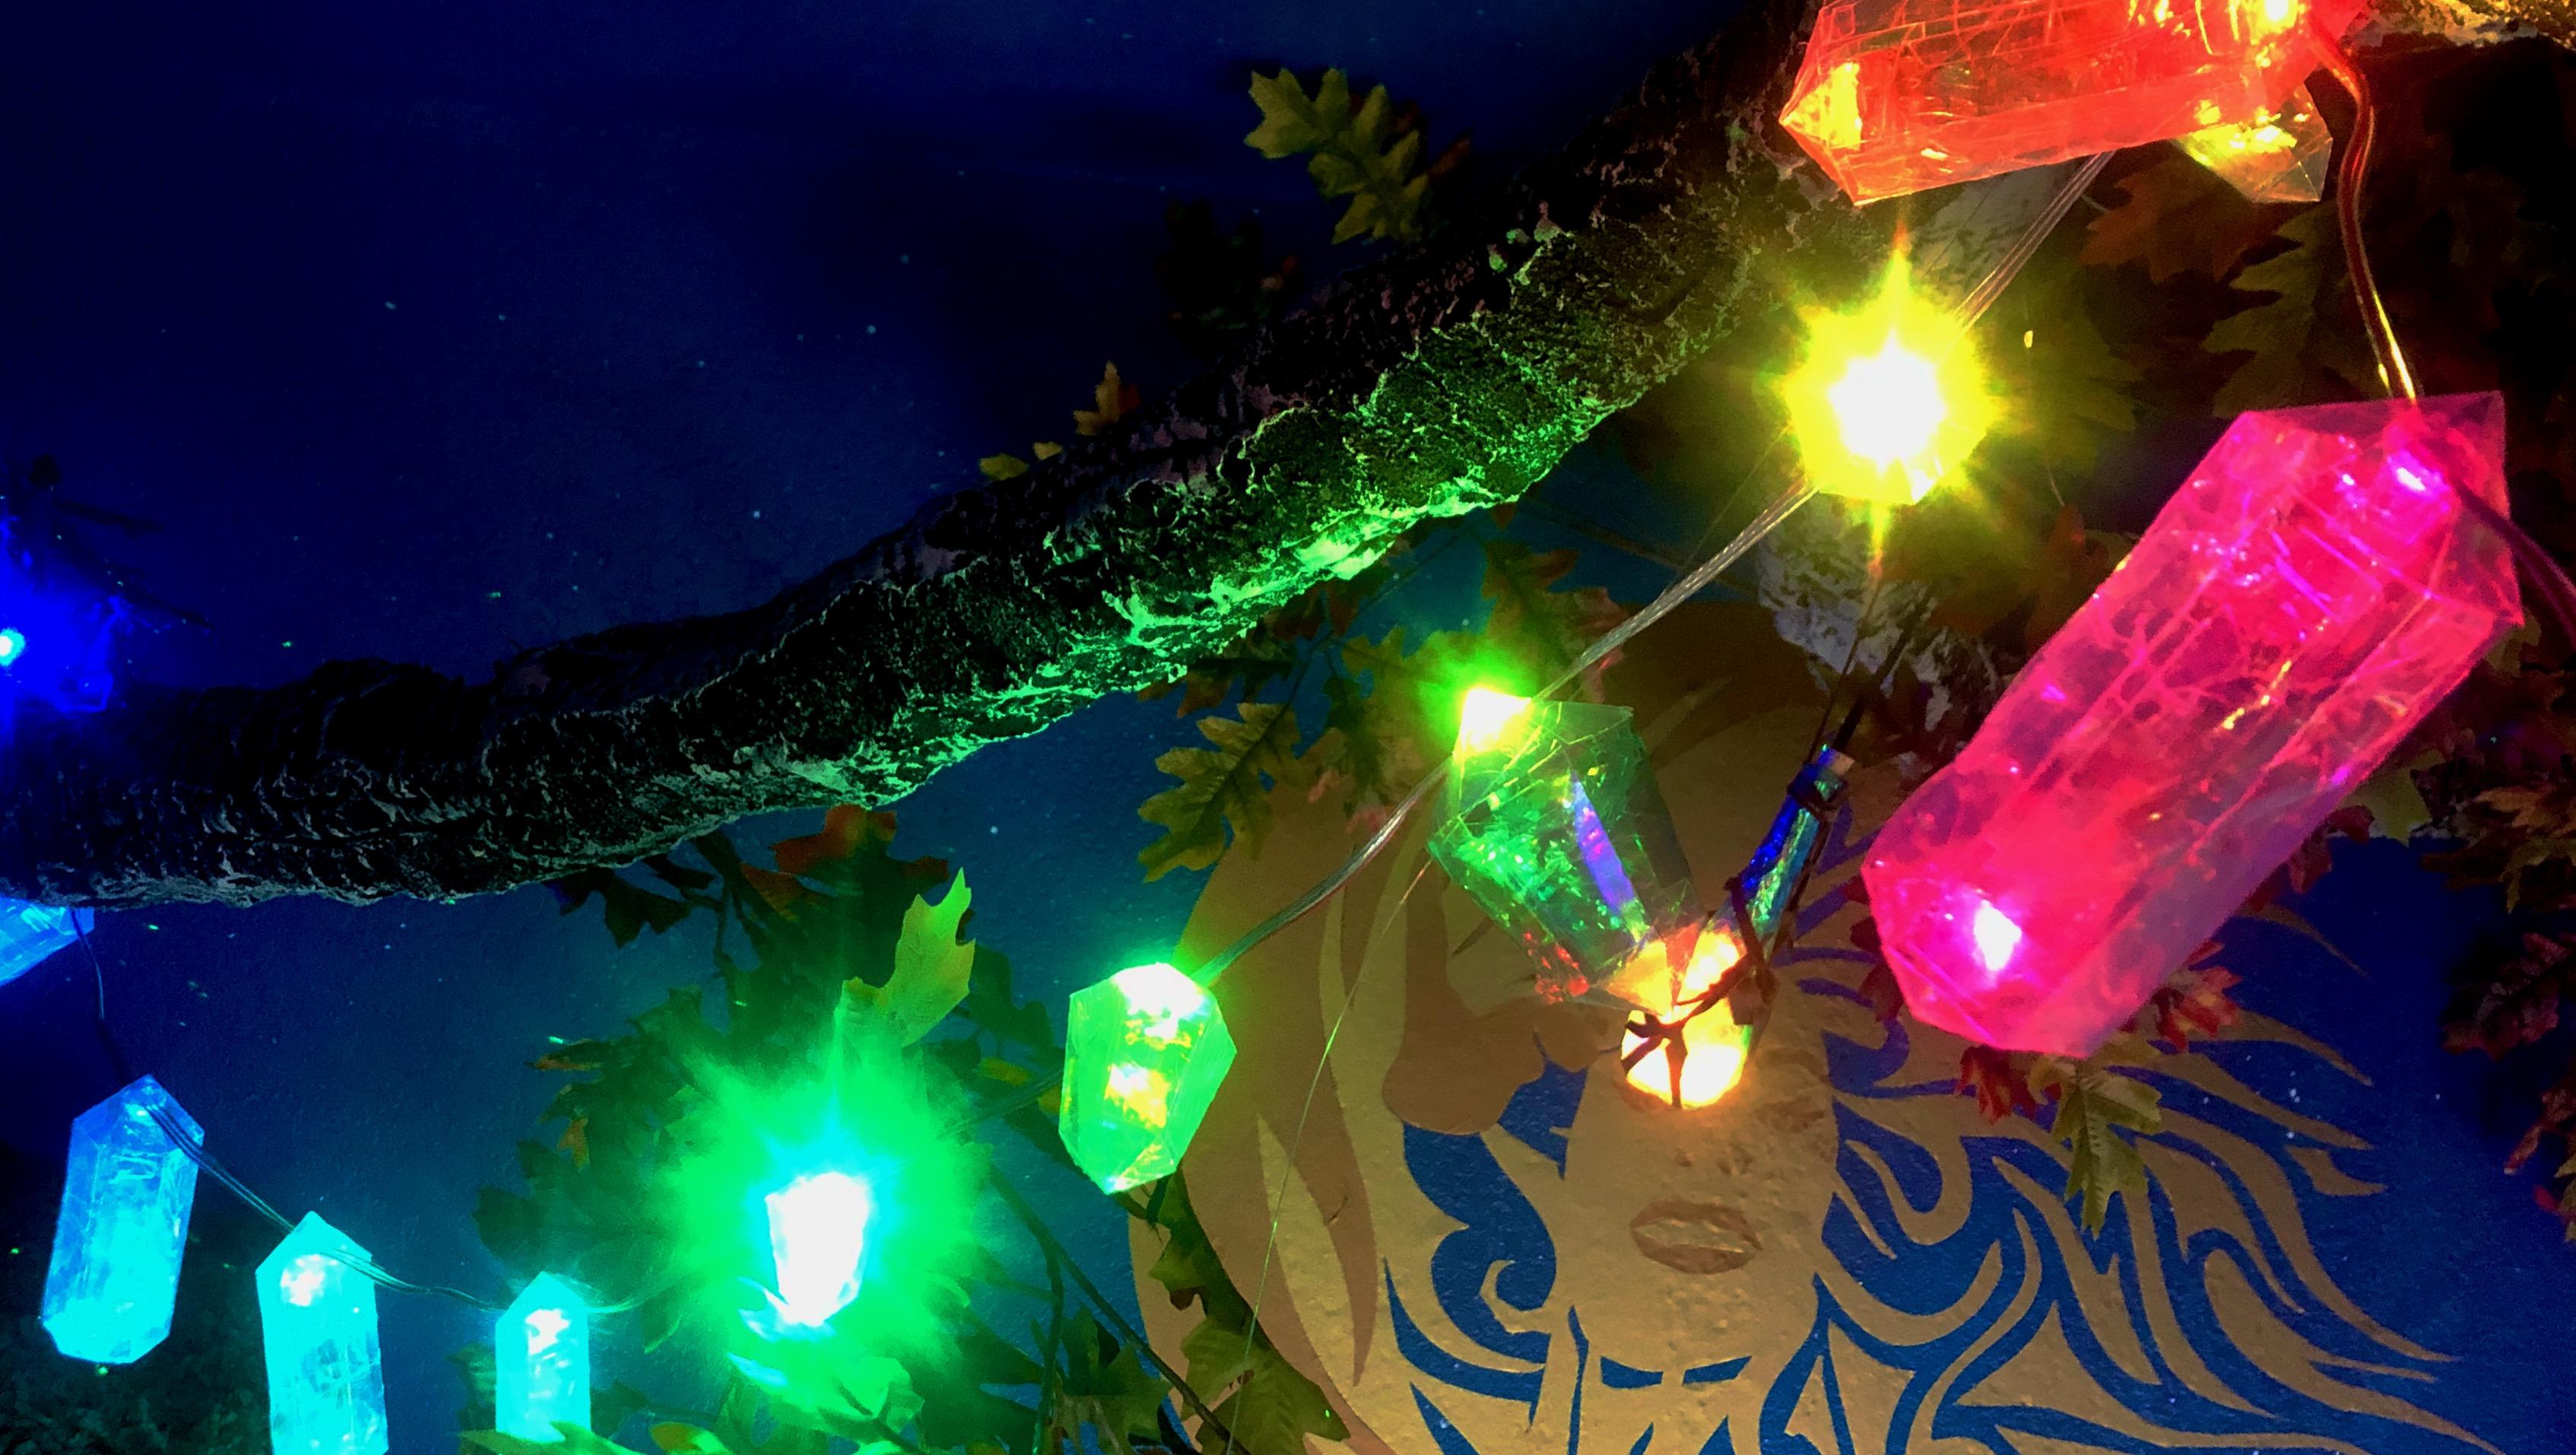 led_pixels_crystals_tree.jpeg